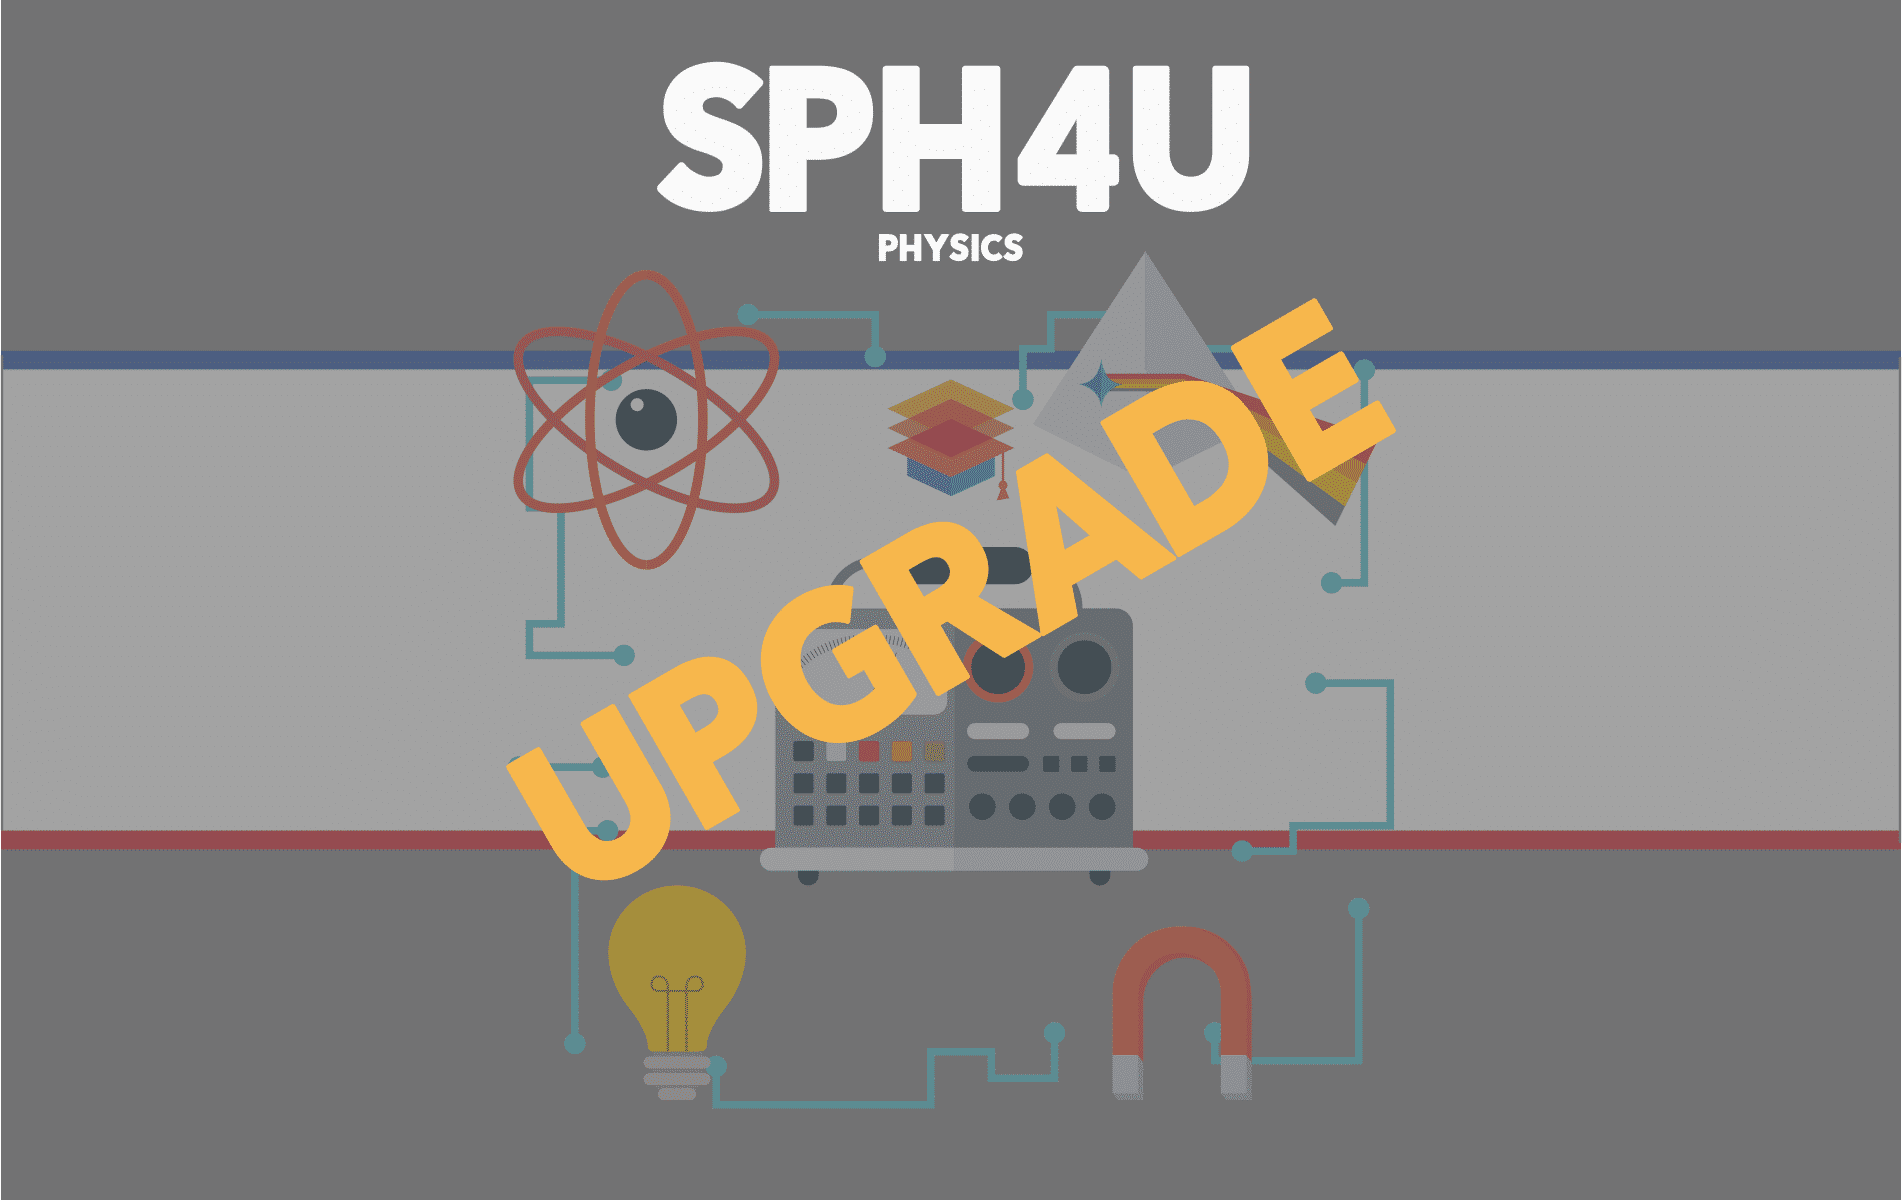 Upgrade SPH4U